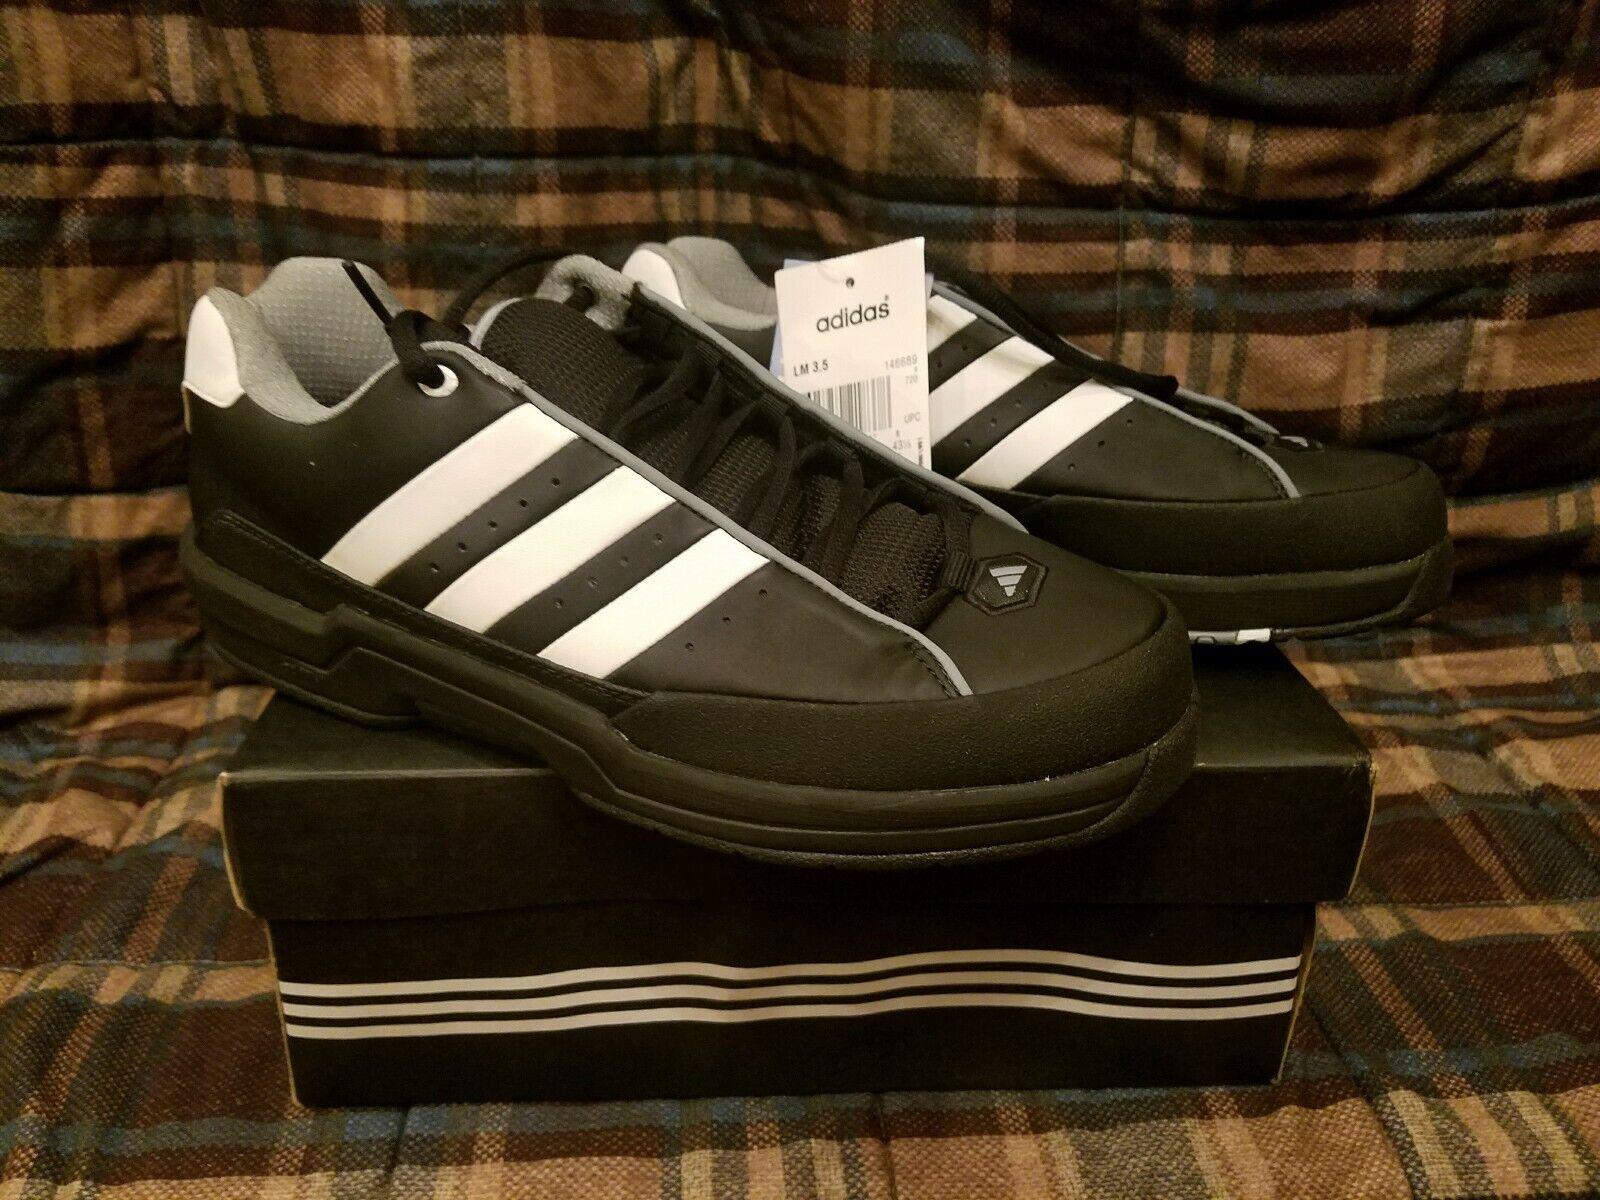 Rare Adidas Skateboard Shoes Lance Mountain